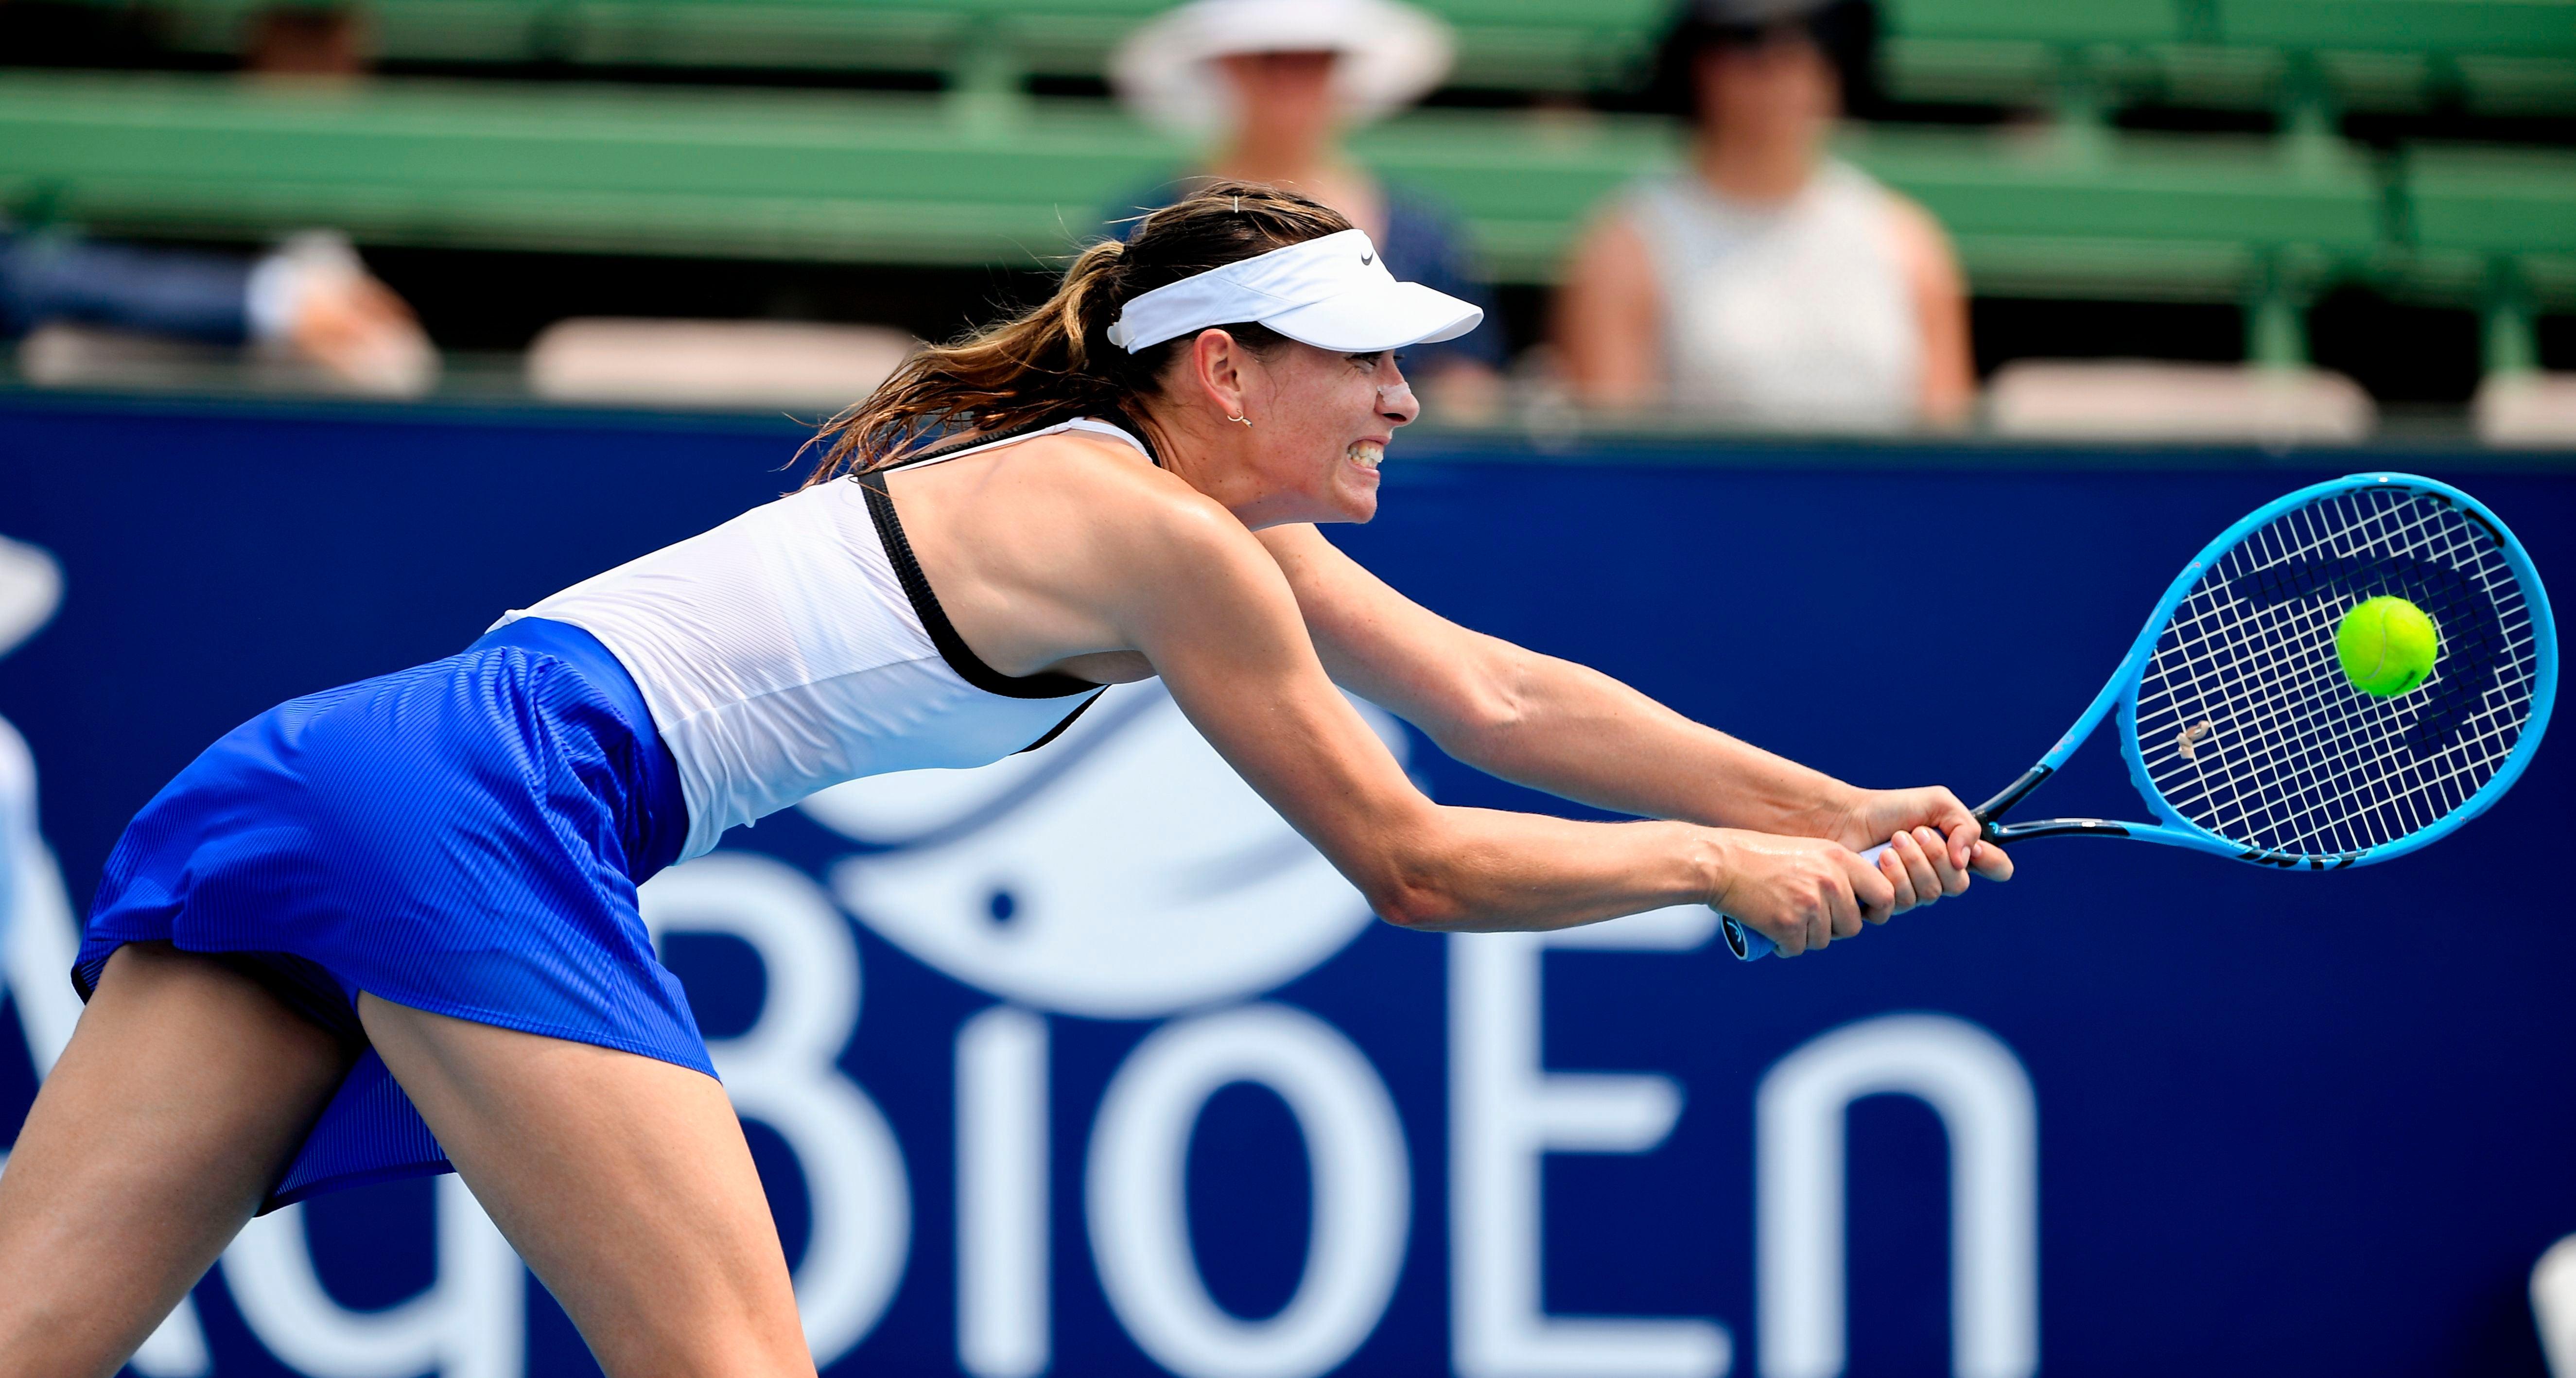 Tennis Australien Open